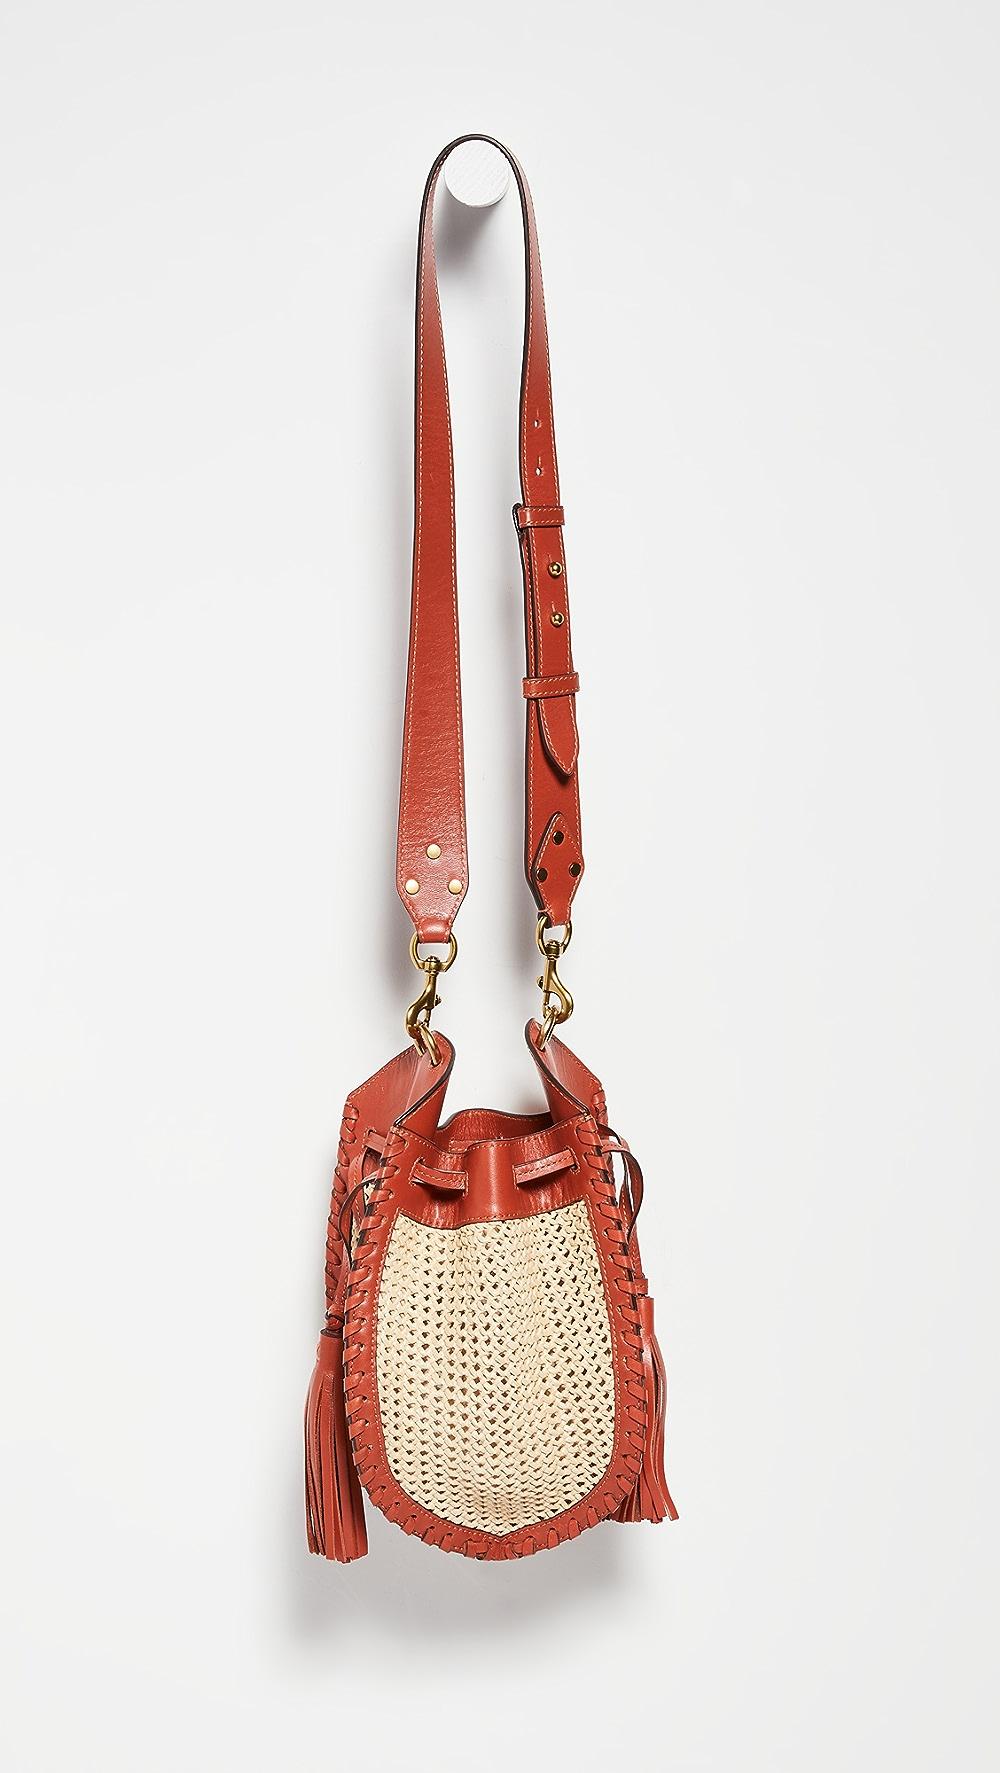 Fine Isabel Marant - Radja Bucket Bag Pretty And Colorful